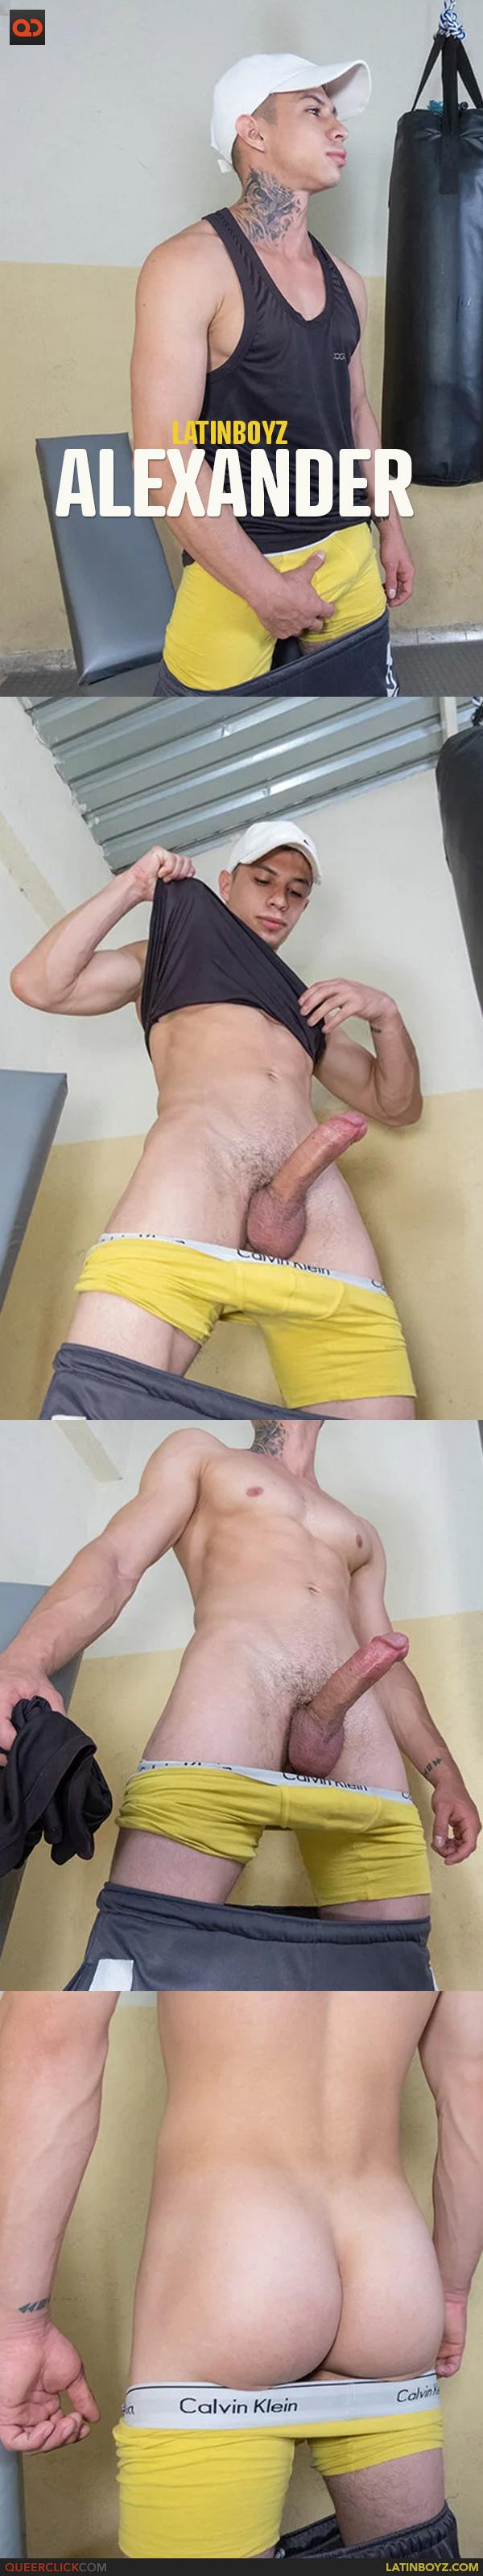 LatinBoyz: Alexander